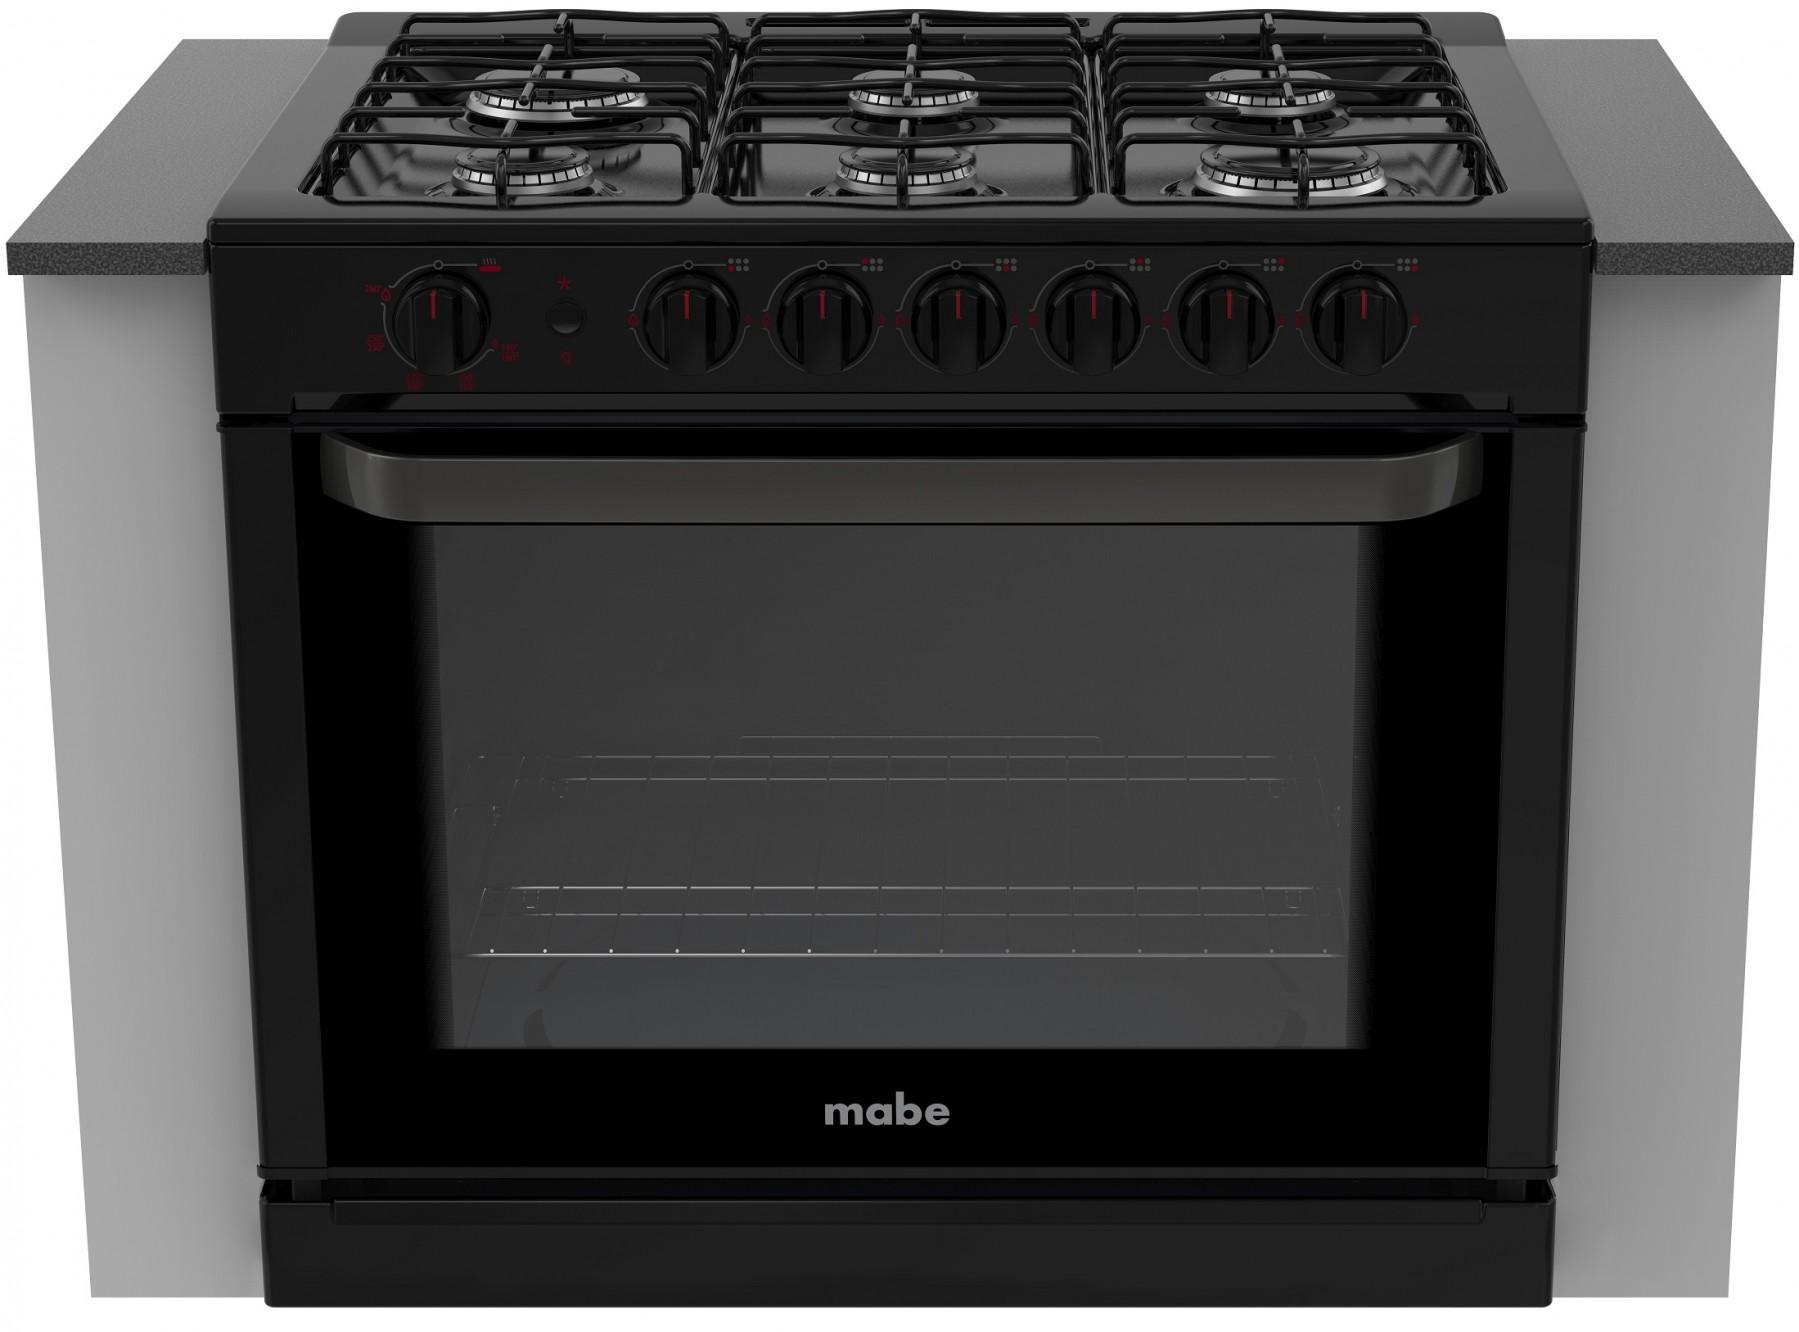 Intermuebles estufa de gas marca mabe color negra 80cm for Estufa profesional